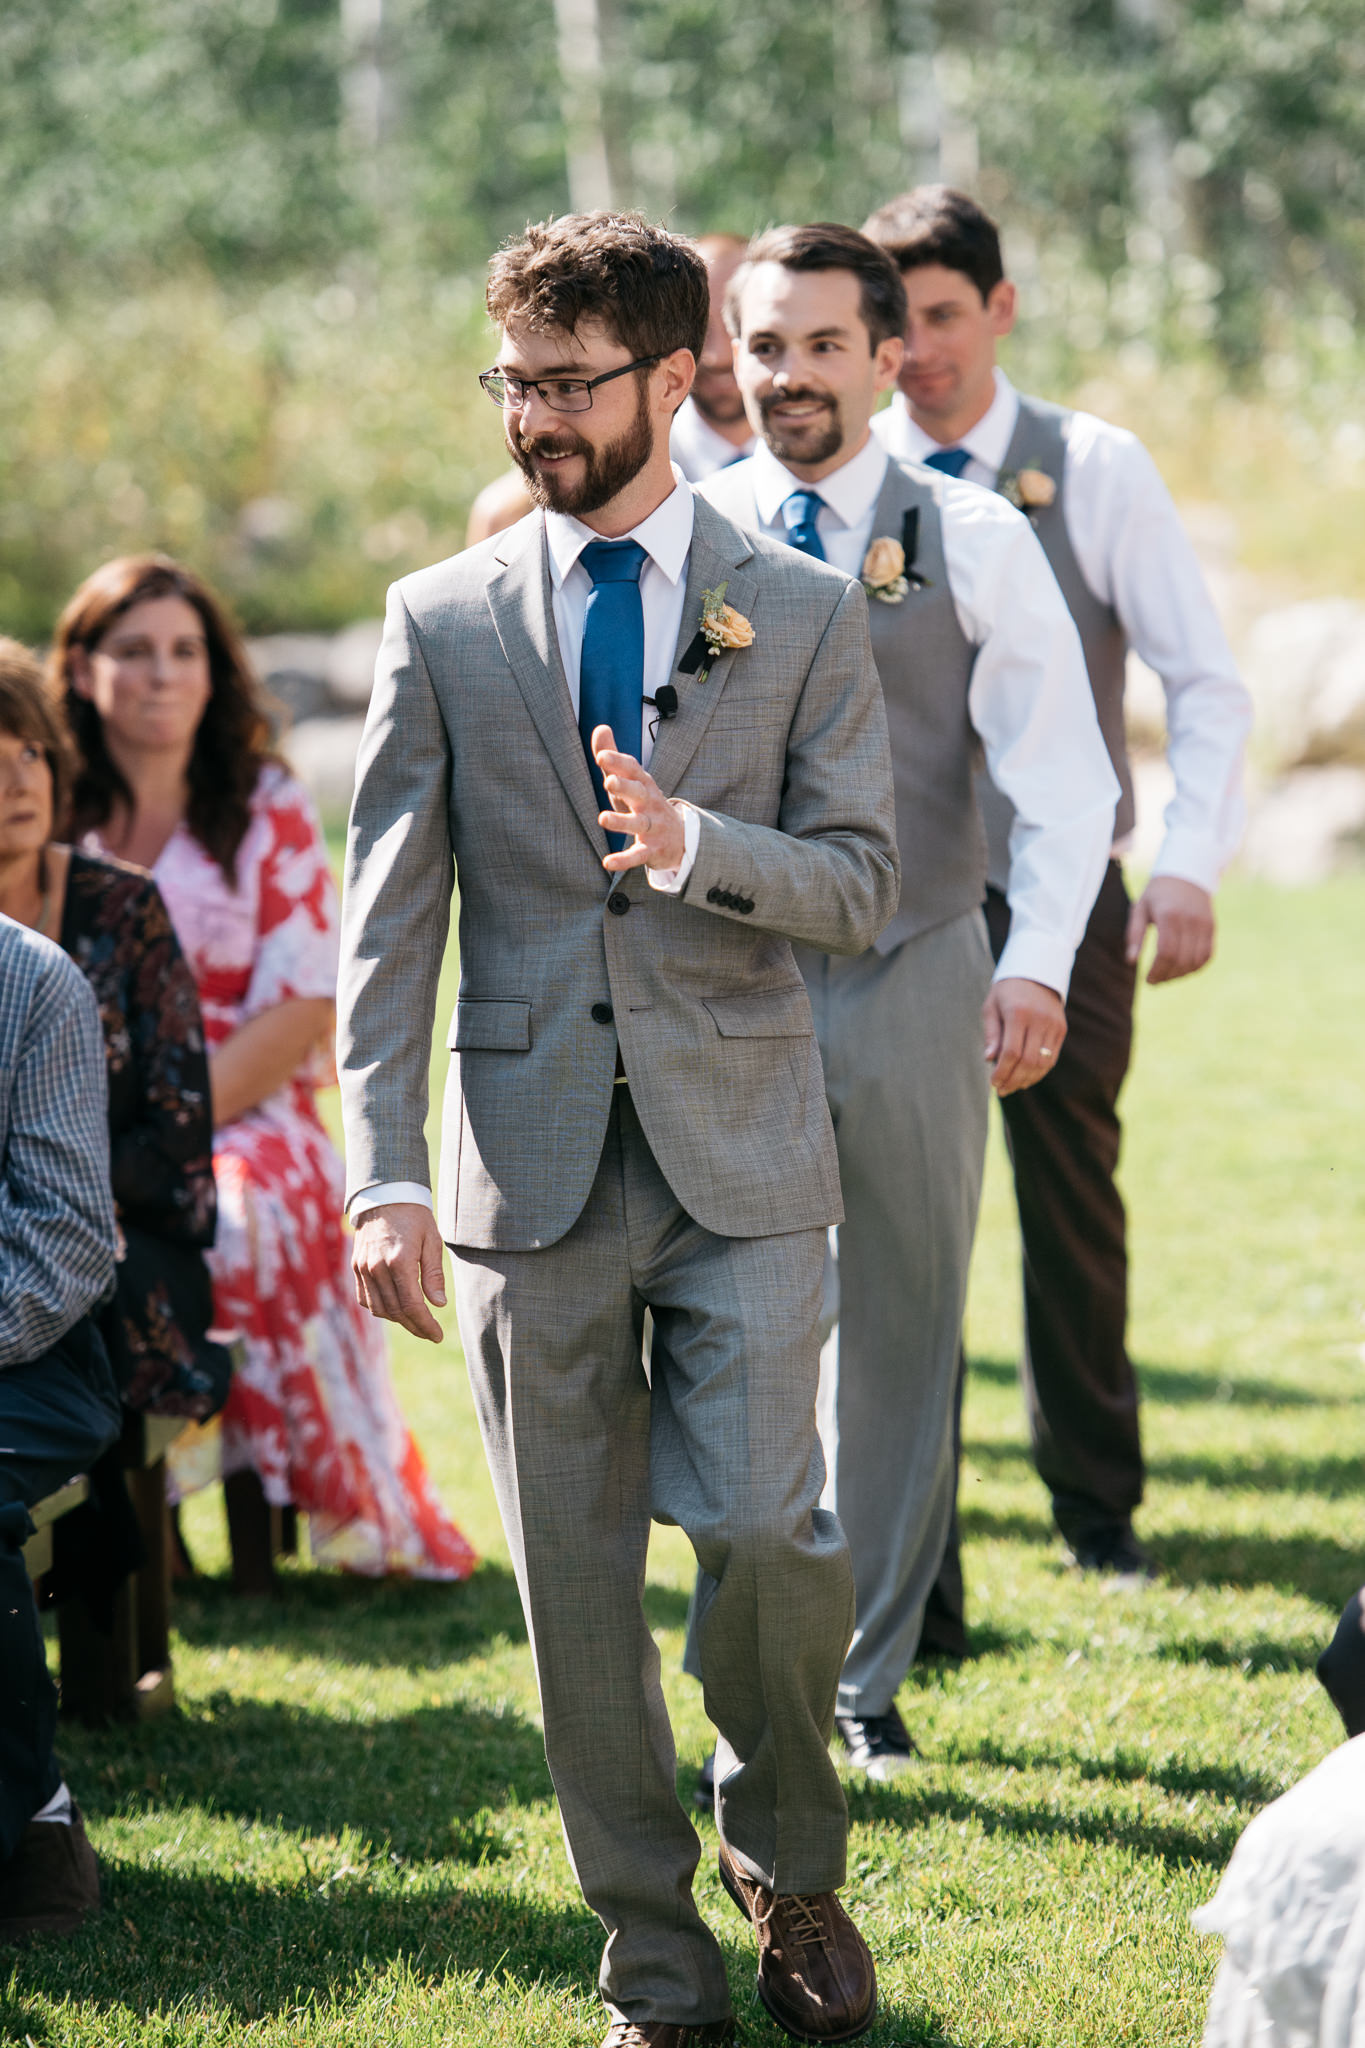 227_ONL_Kat_Nick_Wedding_Trevor_Hooper_Photo.jpg